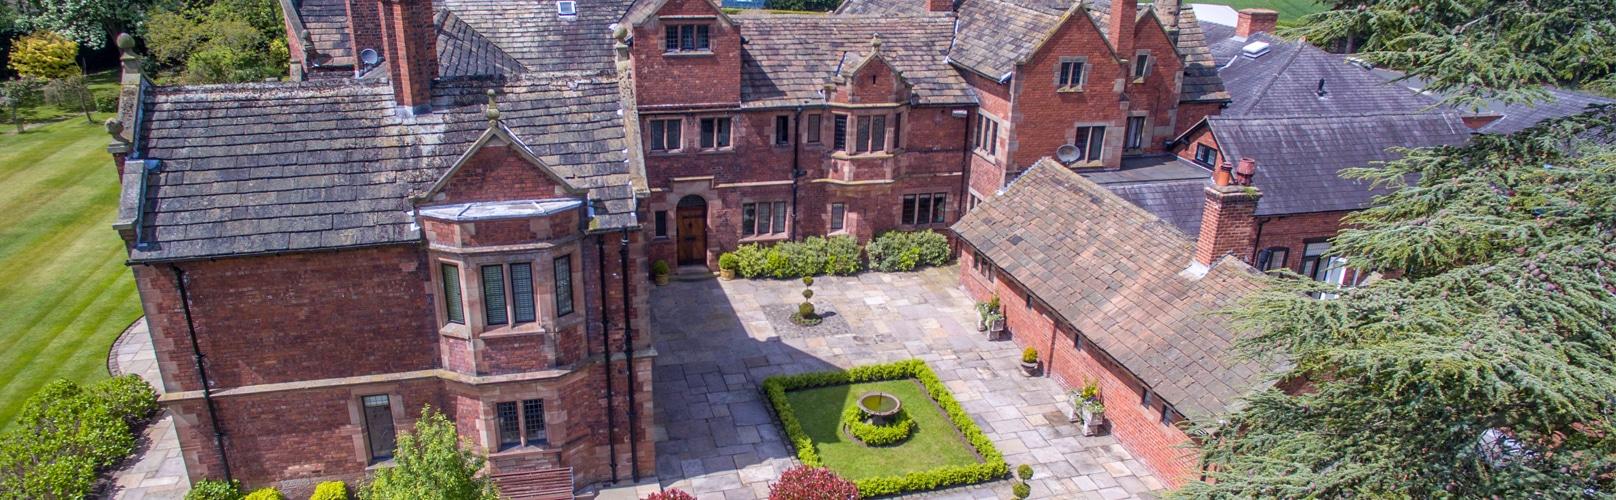 Colshaw Hall Entrance